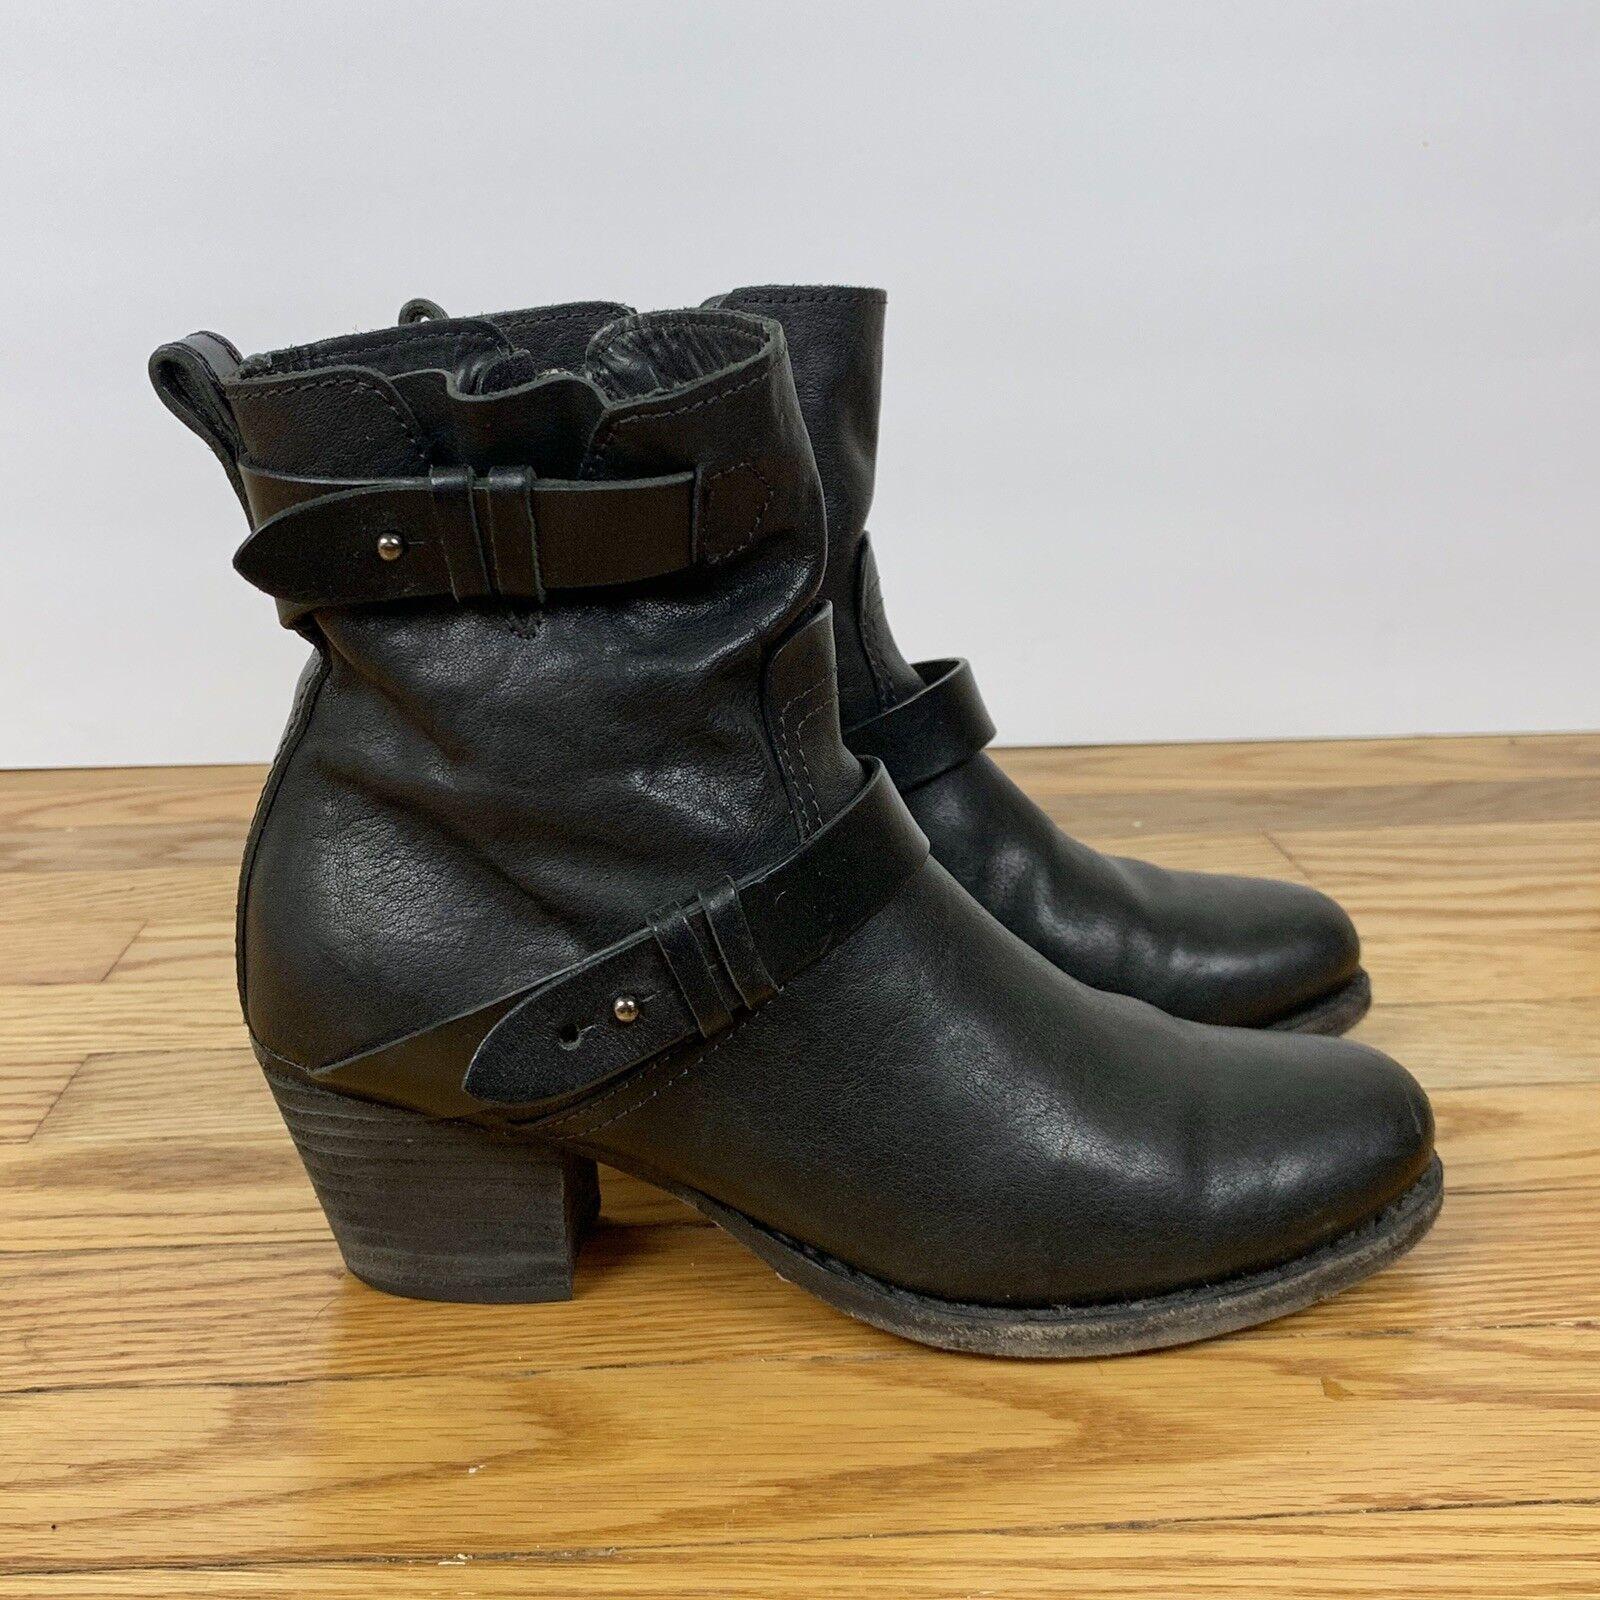 Rag & Bone 37 7 Black Leather Harper Moto Short Heeled Boots Booties  550